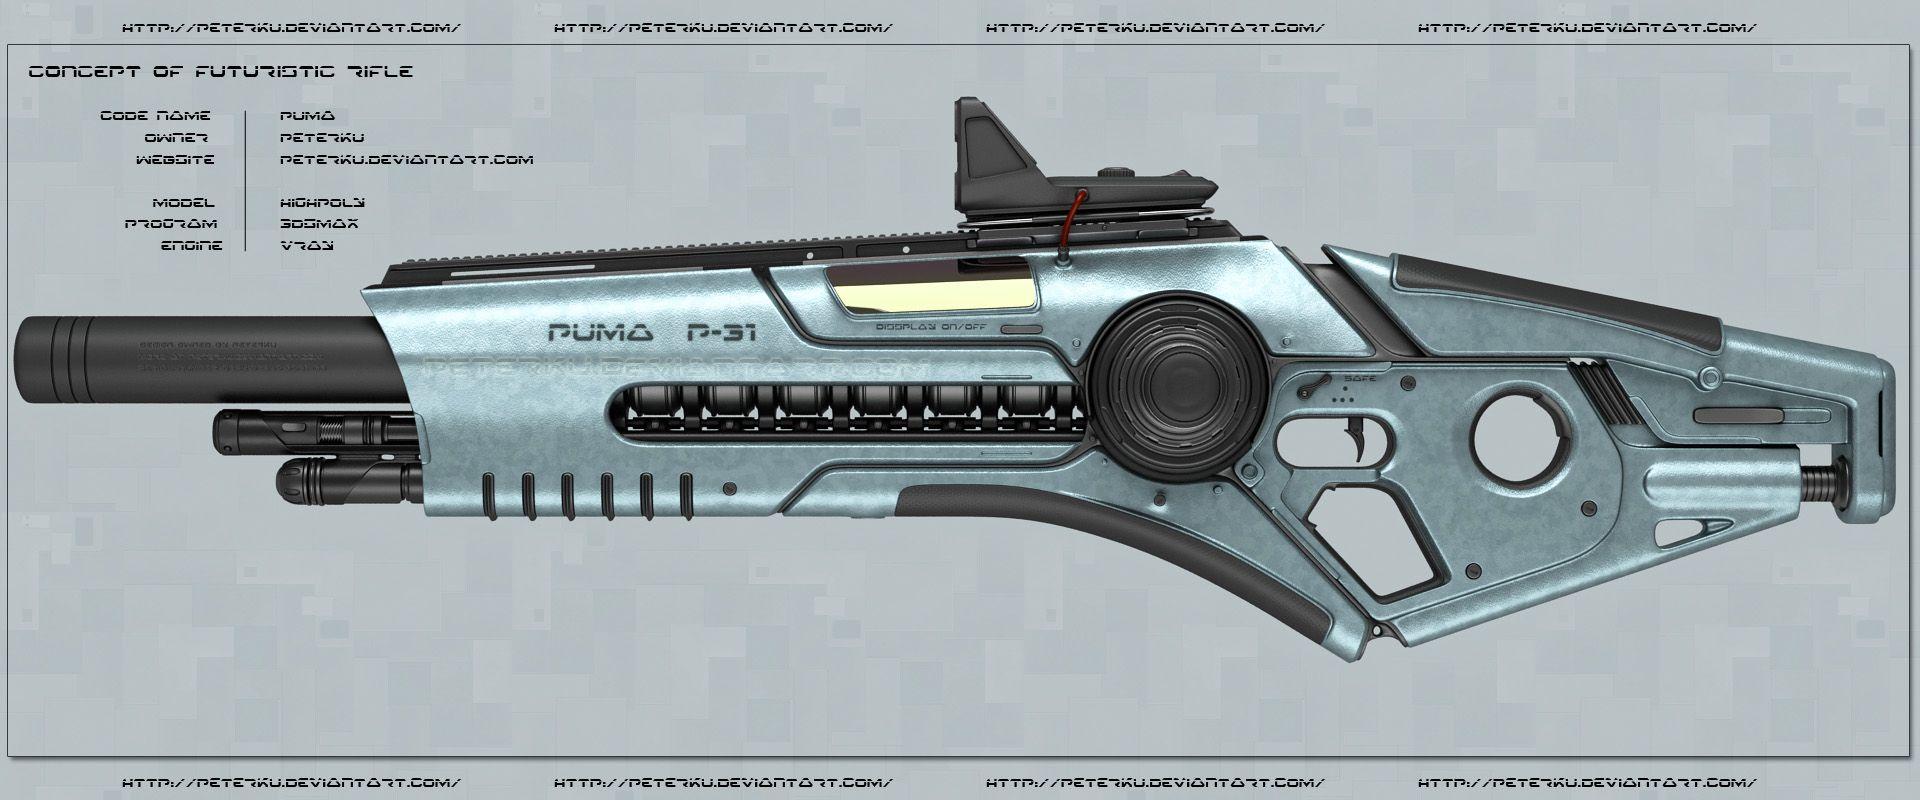 future handgun designs - Google-søk | Tig | Pinterest